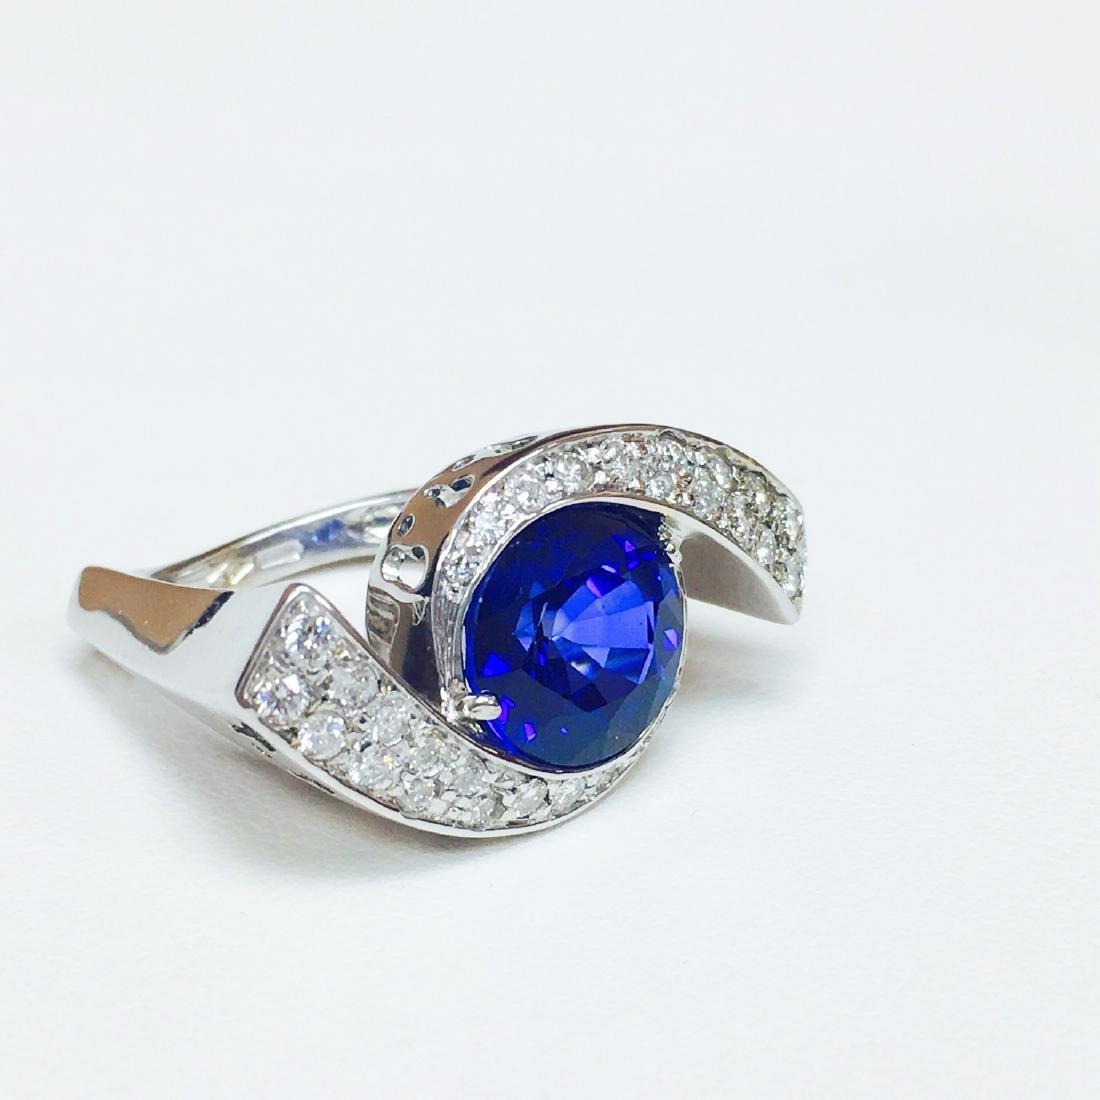 6.00 Carat Blue Sapphire & DIAMOND EVIL EYE STYLE RING - 3